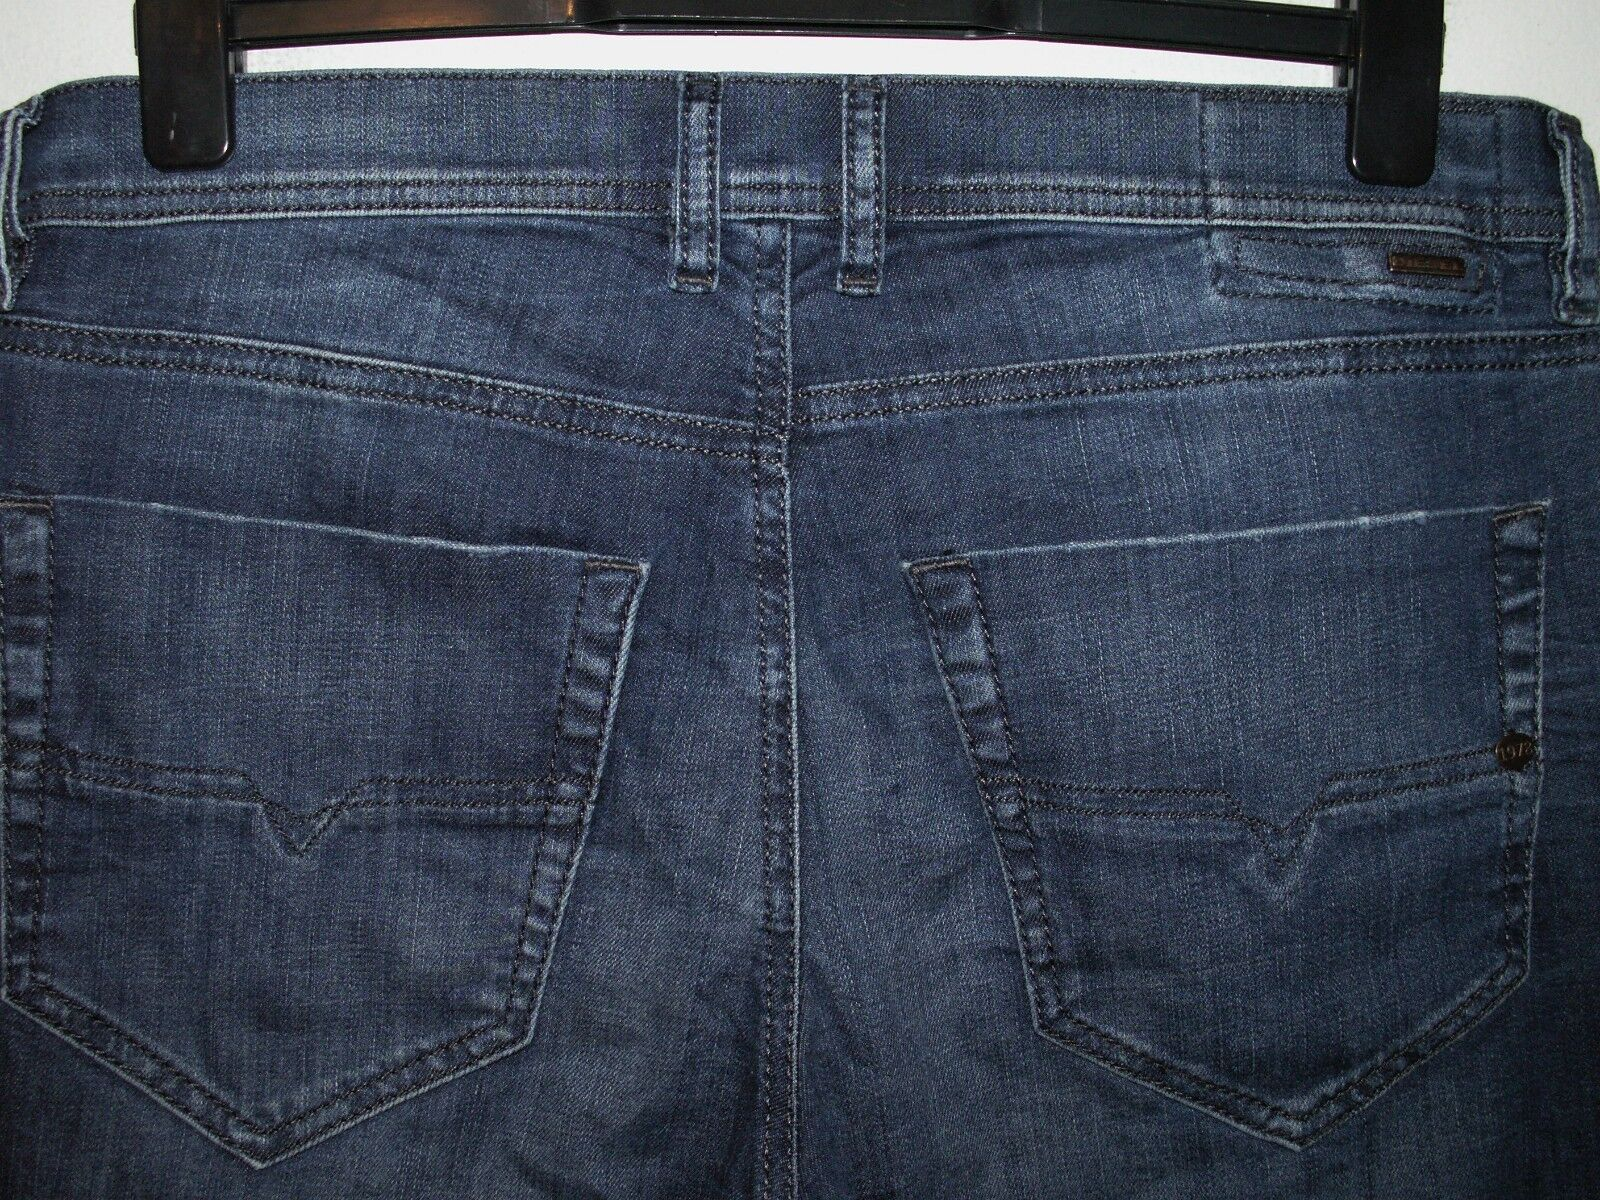 Diesel Tepphar Slim carrot carrot Slim Jeans 0836X stretch W32 L32 4941 £ 119.99 VENTE £ 79.99 8a5791